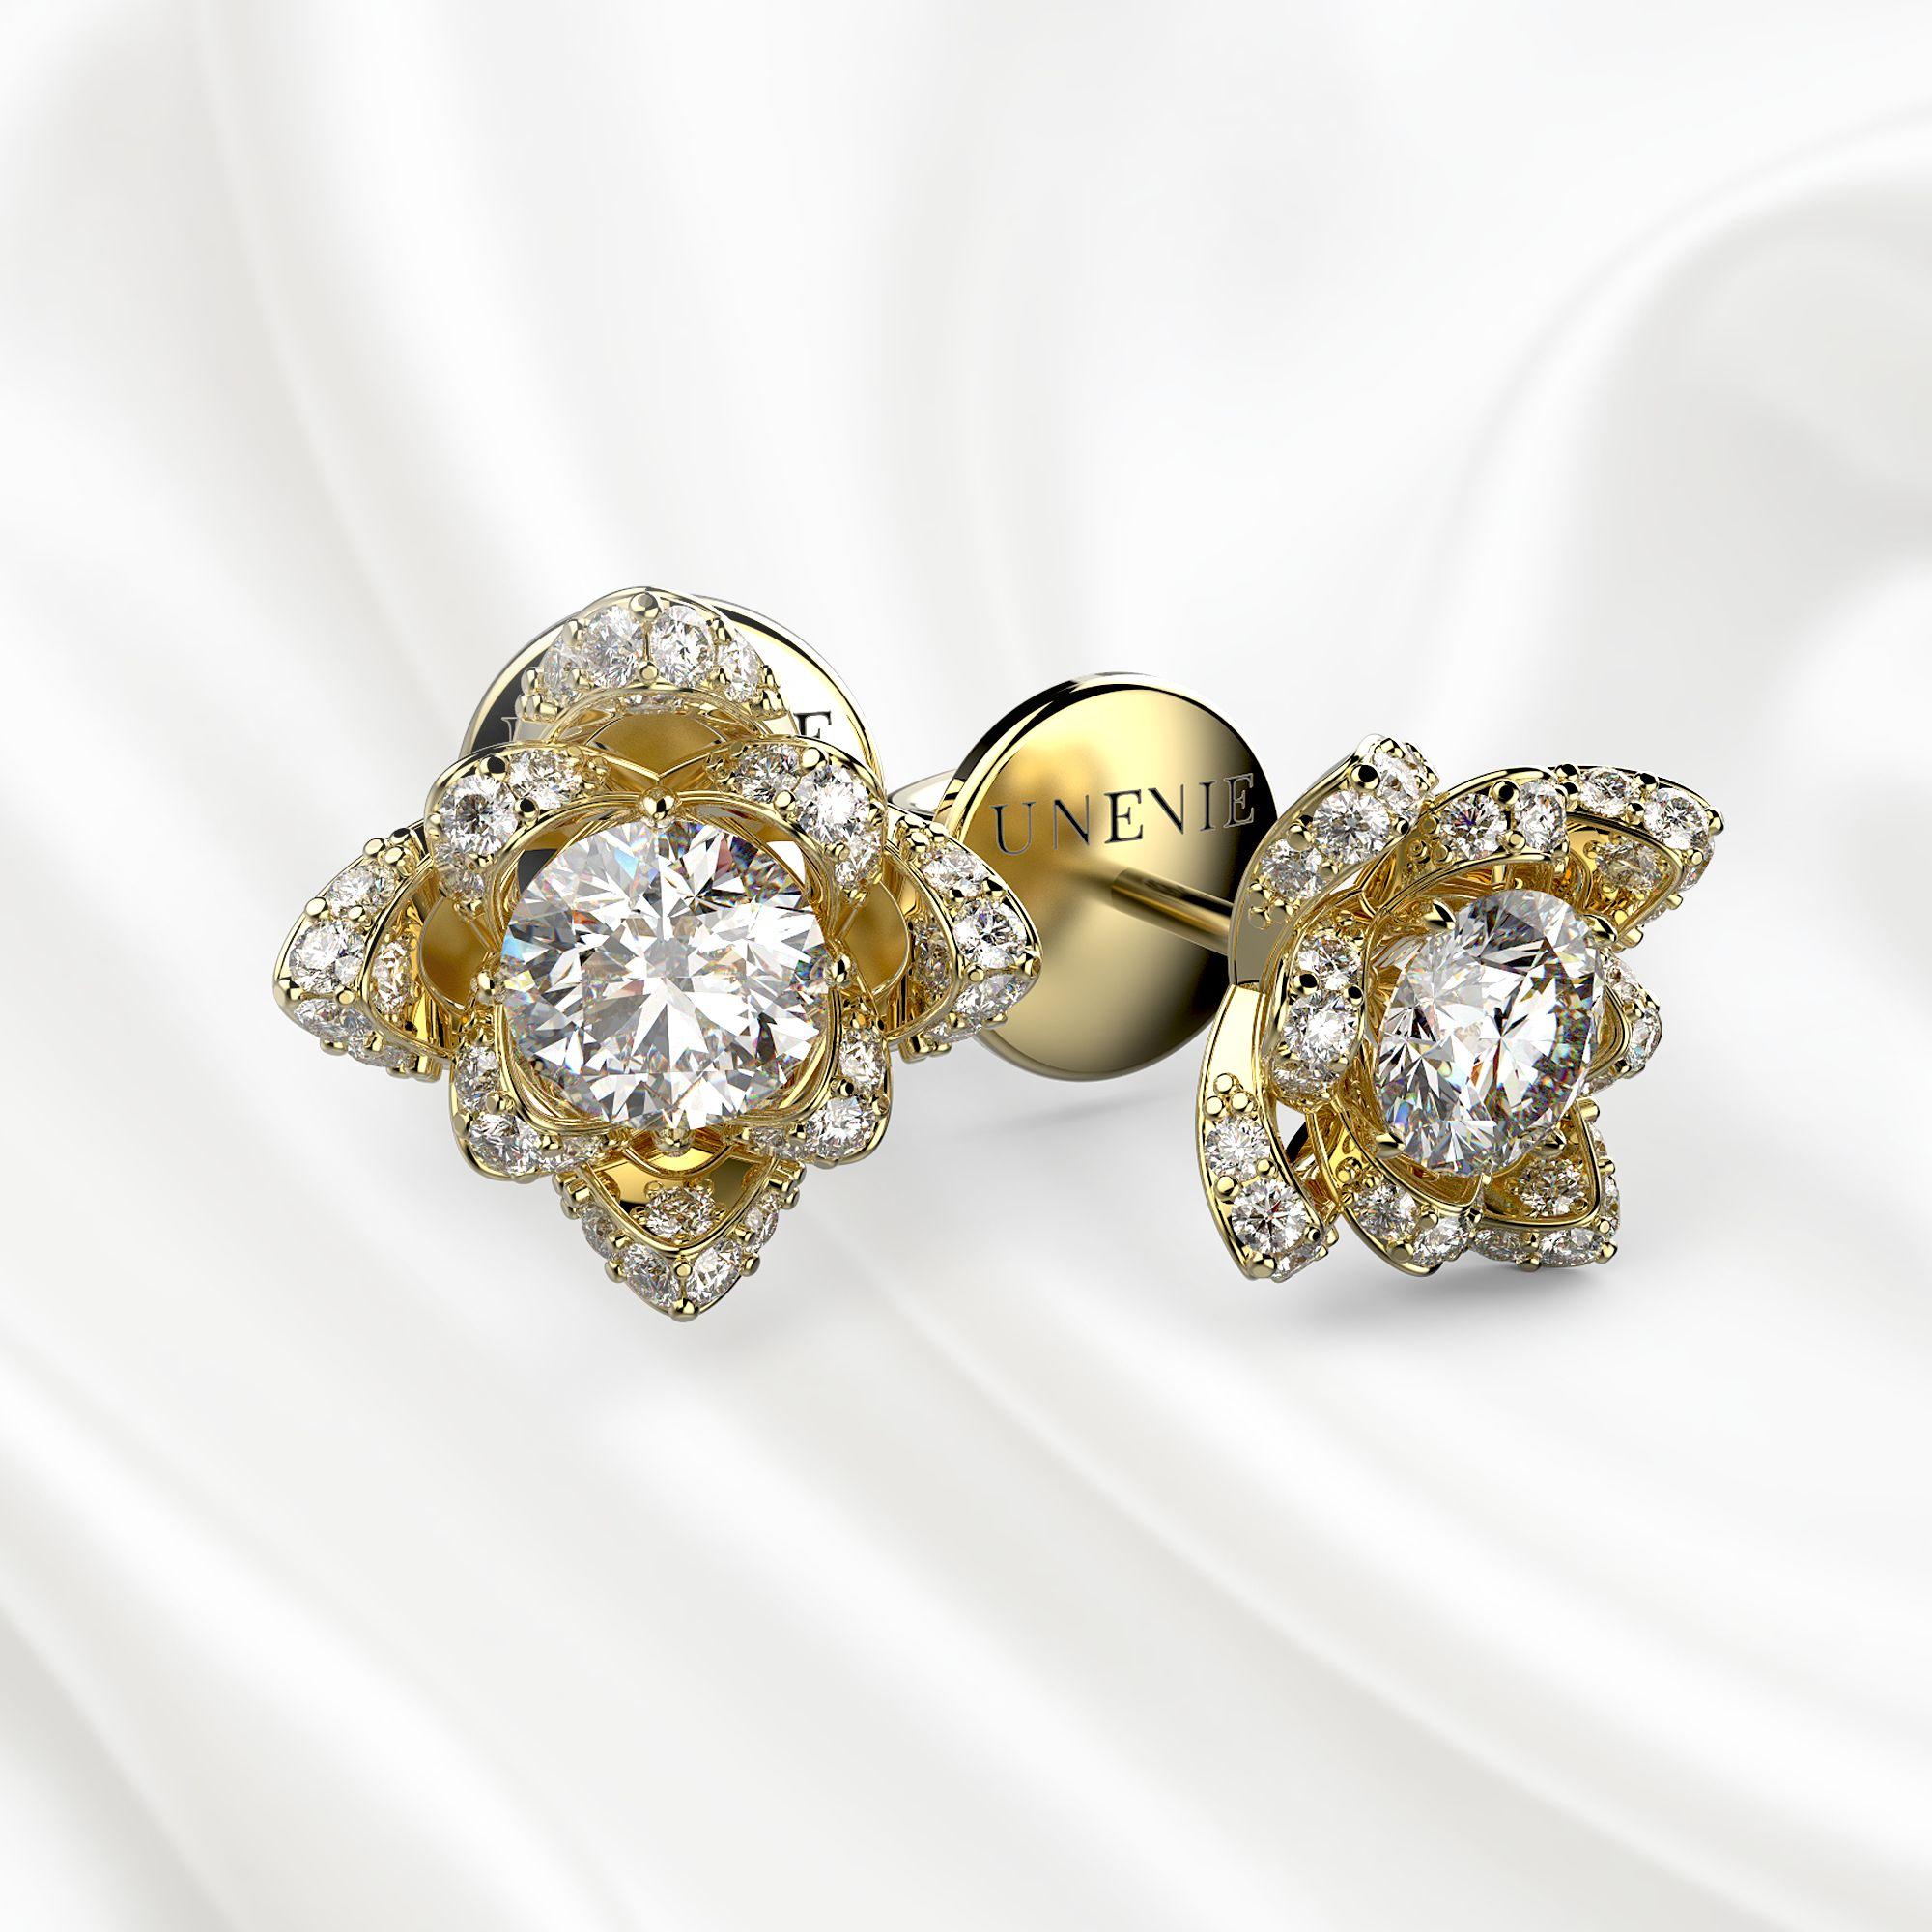 S5 Серьги из желтого золота с 34 бриллиантами 0.86 карат